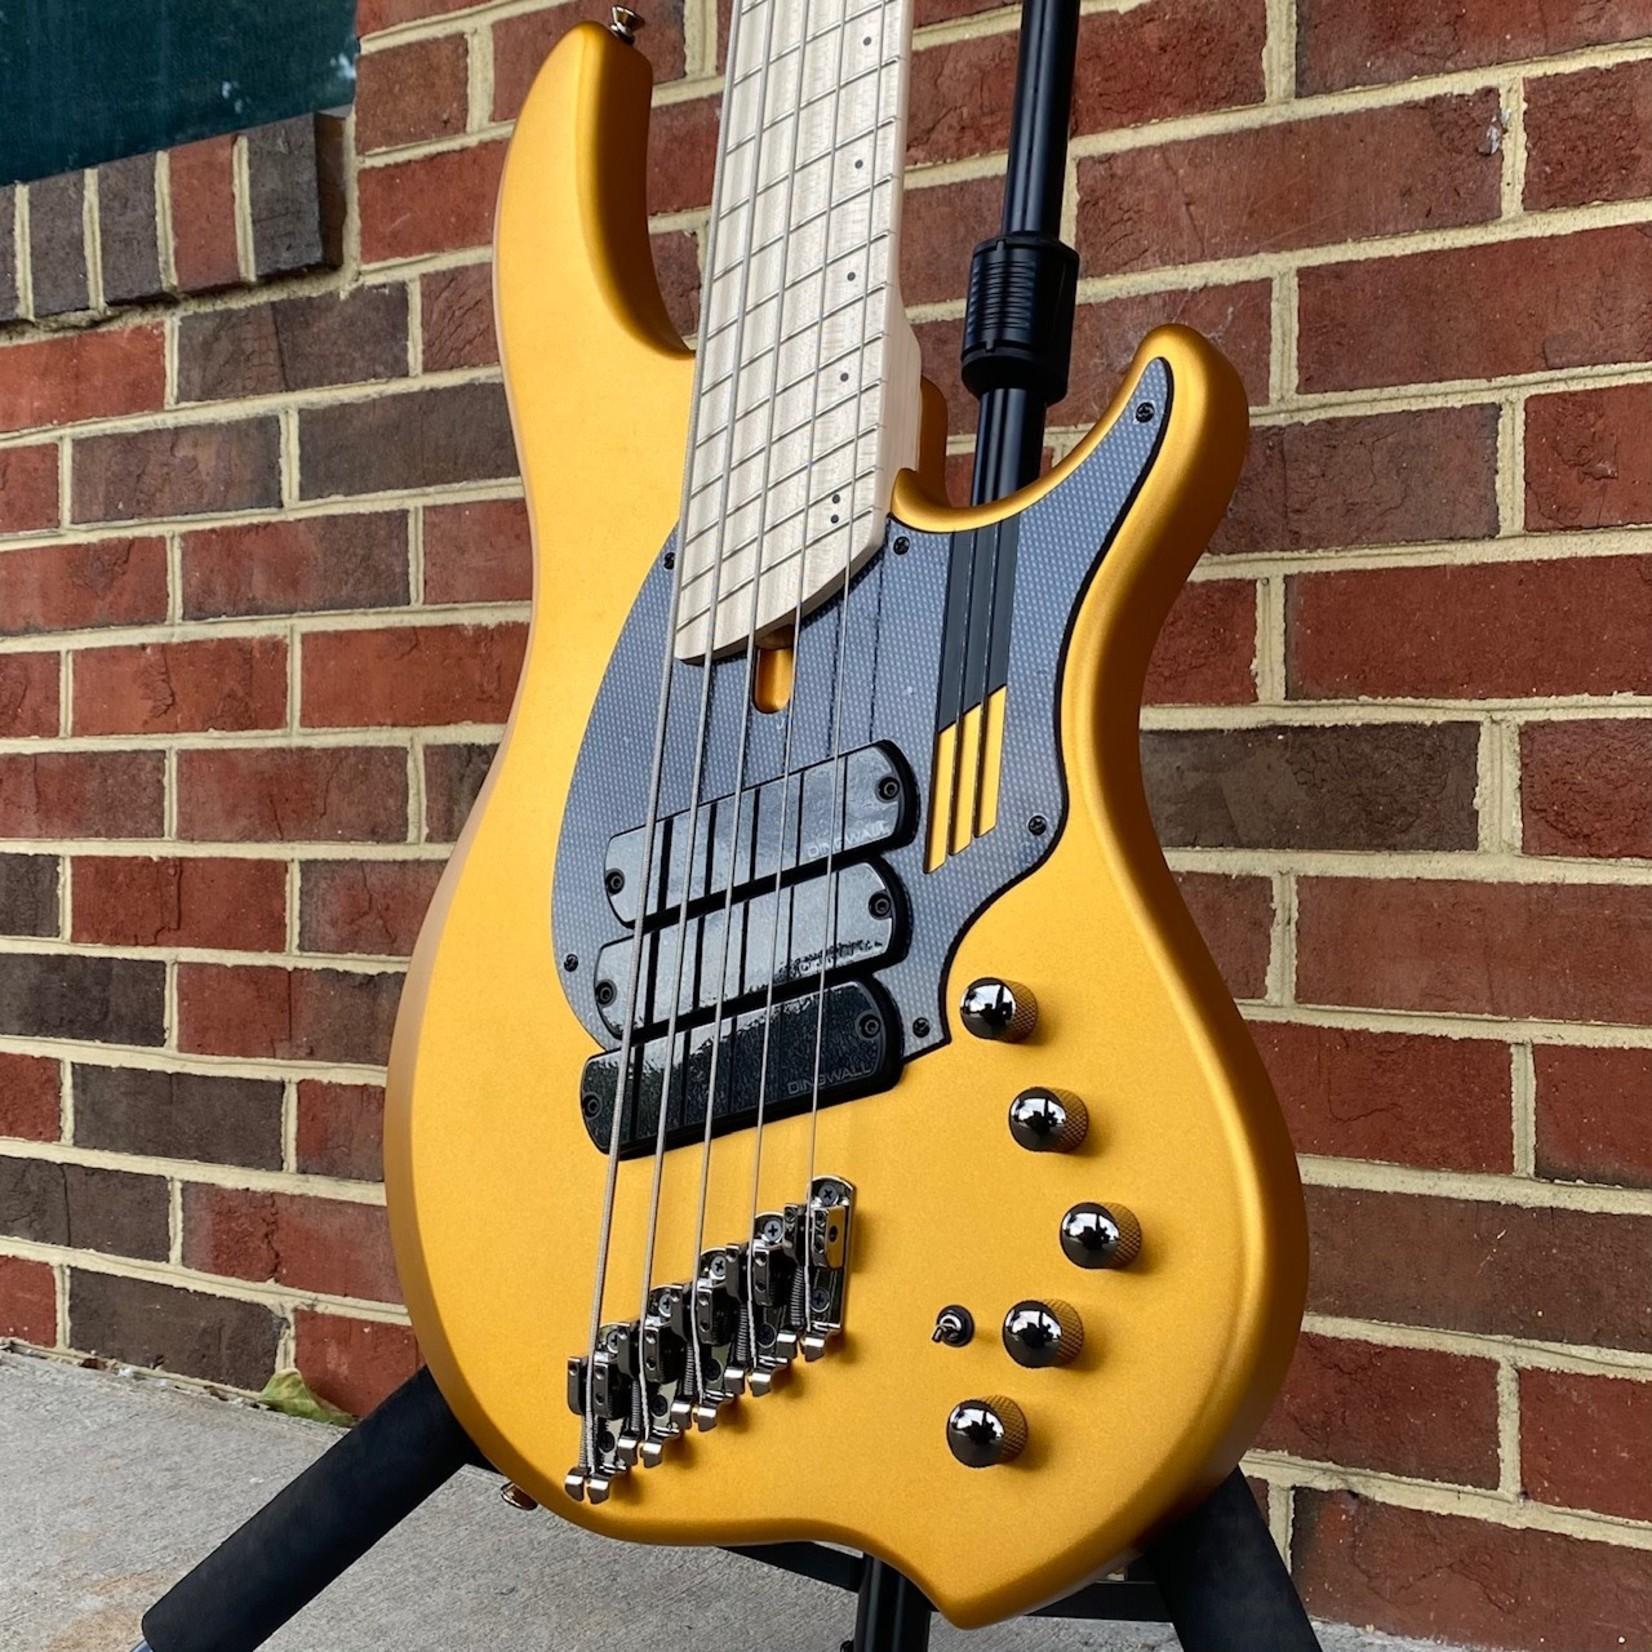 Dingwall Dingwall NG3 5-String, 3x Pickups, Matte Gold Metallic, Maple Fretboard, Matching Headstock, Dingwall Gig Bag, SN# 9446